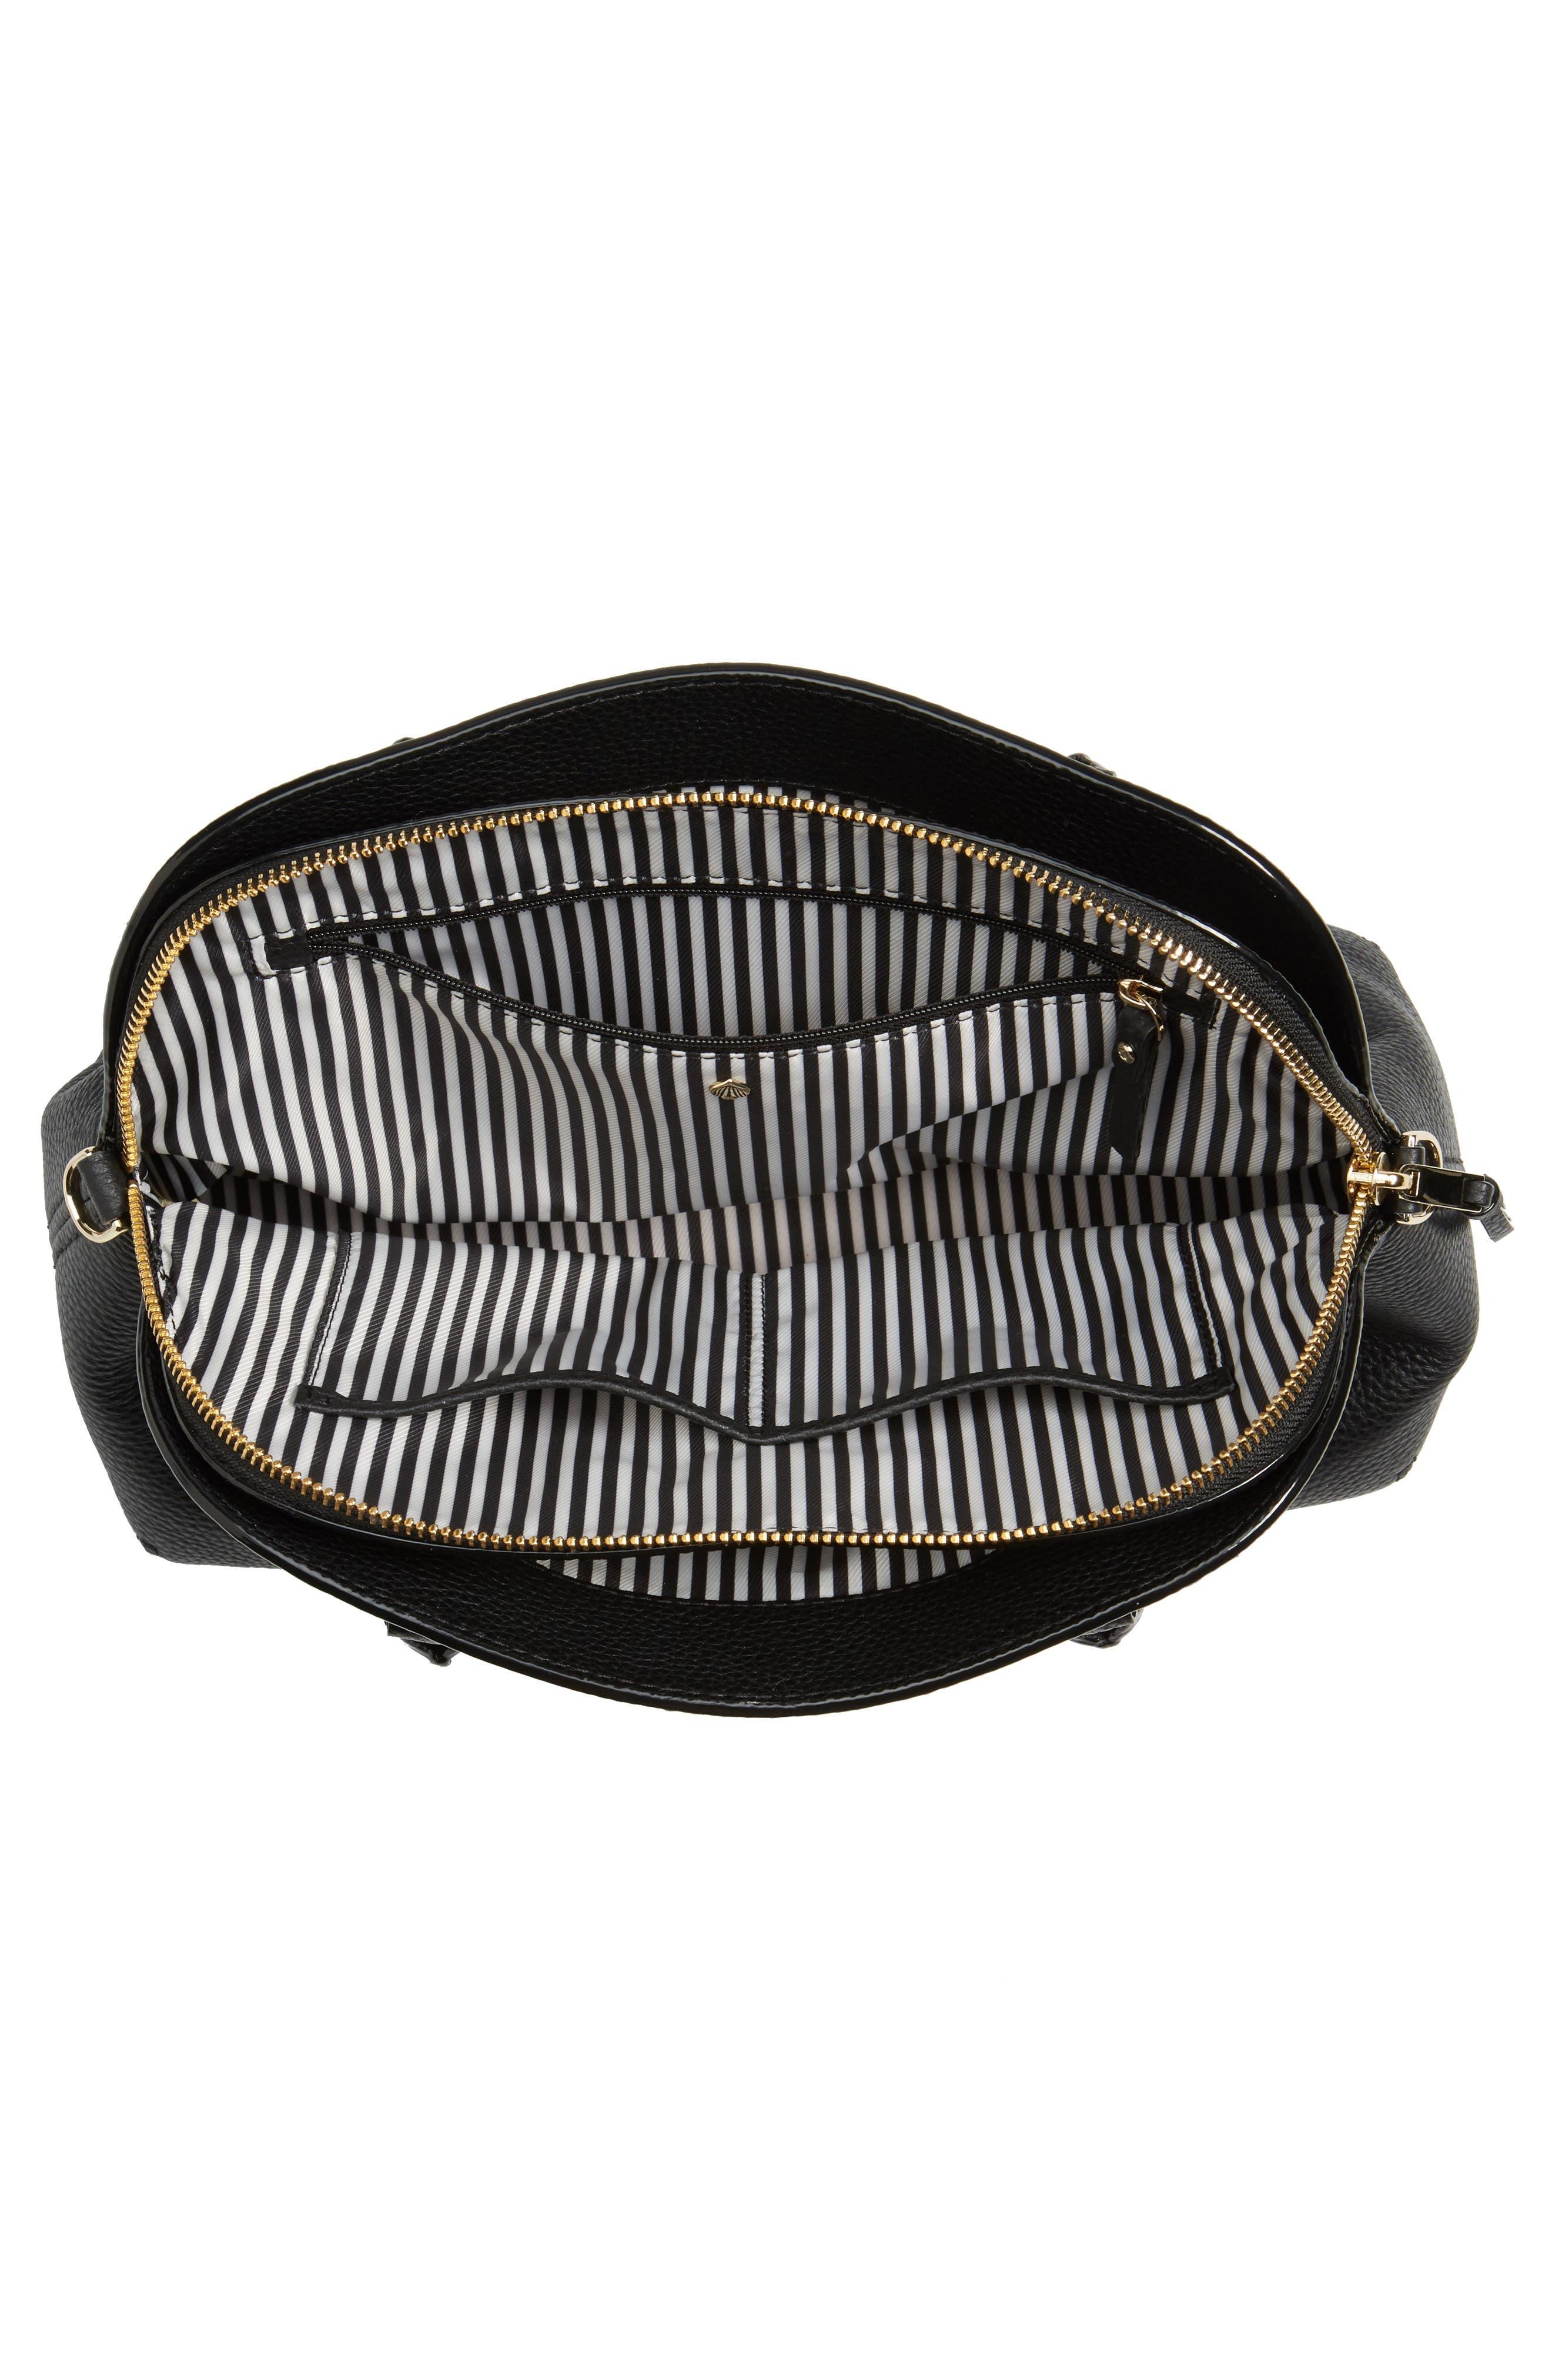 jackson street lottie leather satchel,                             Alternate thumbnail 3, color,                             Black